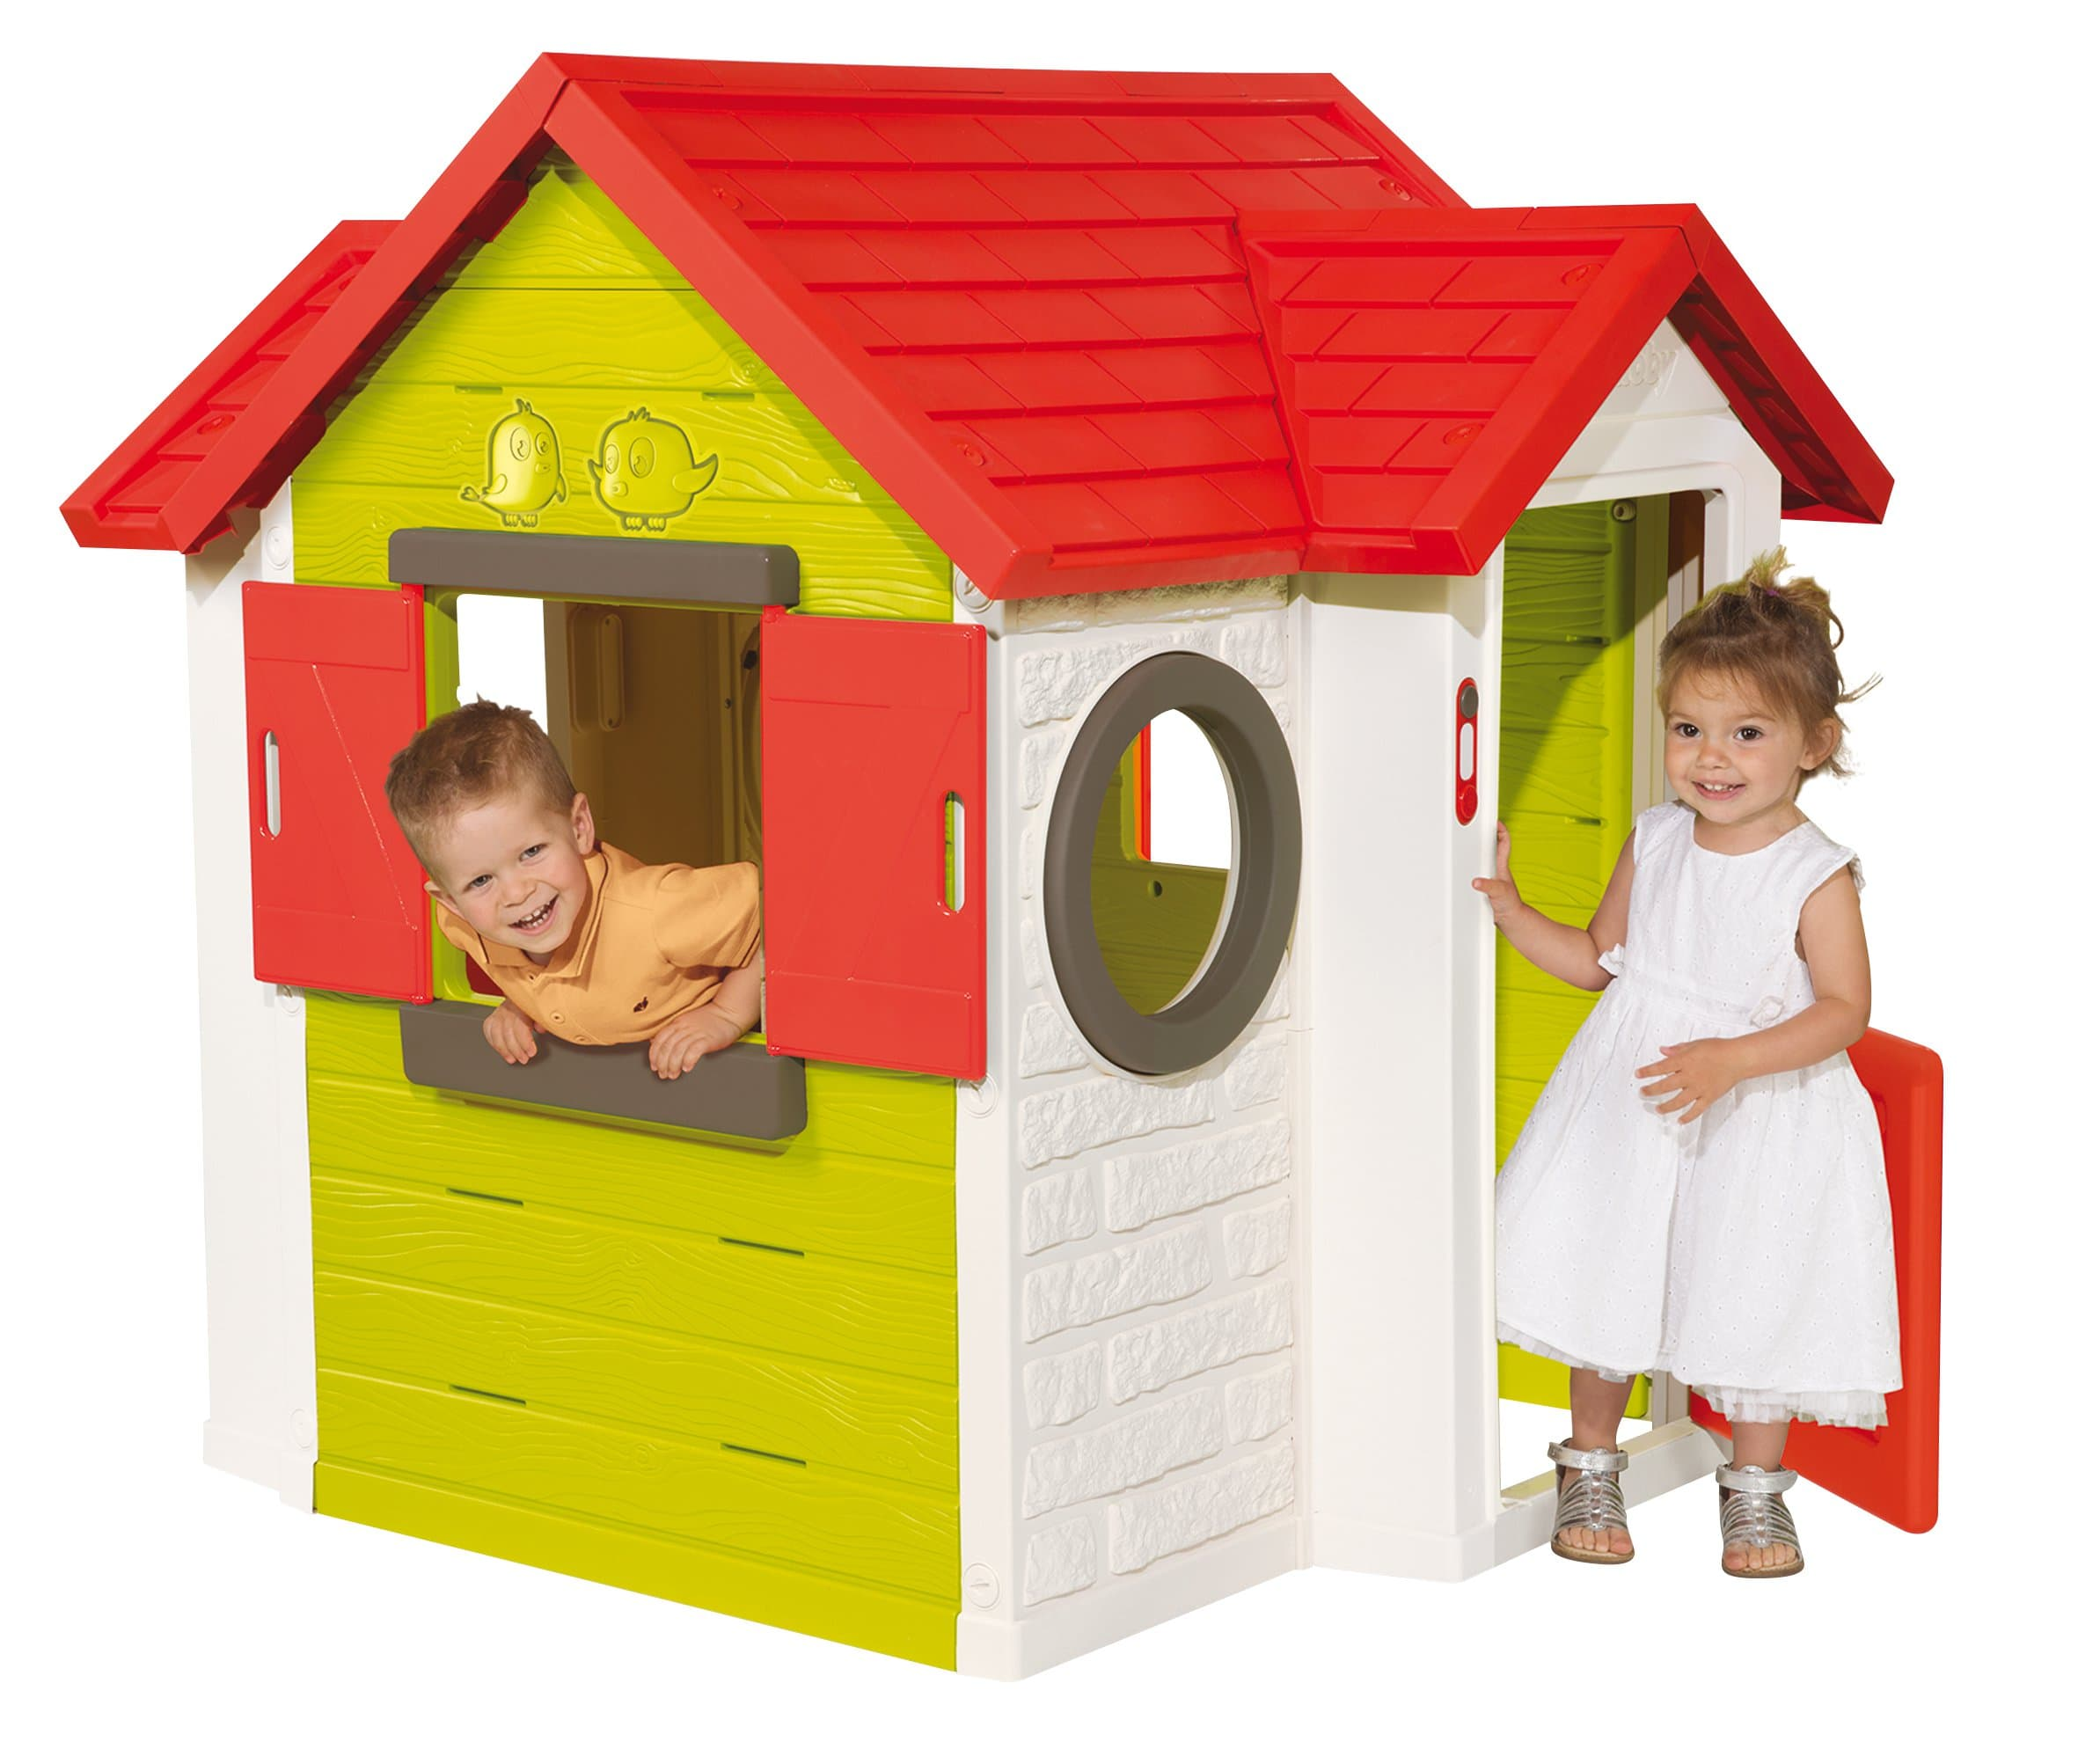 smoby spielhaus mein haus migros. Black Bedroom Furniture Sets. Home Design Ideas